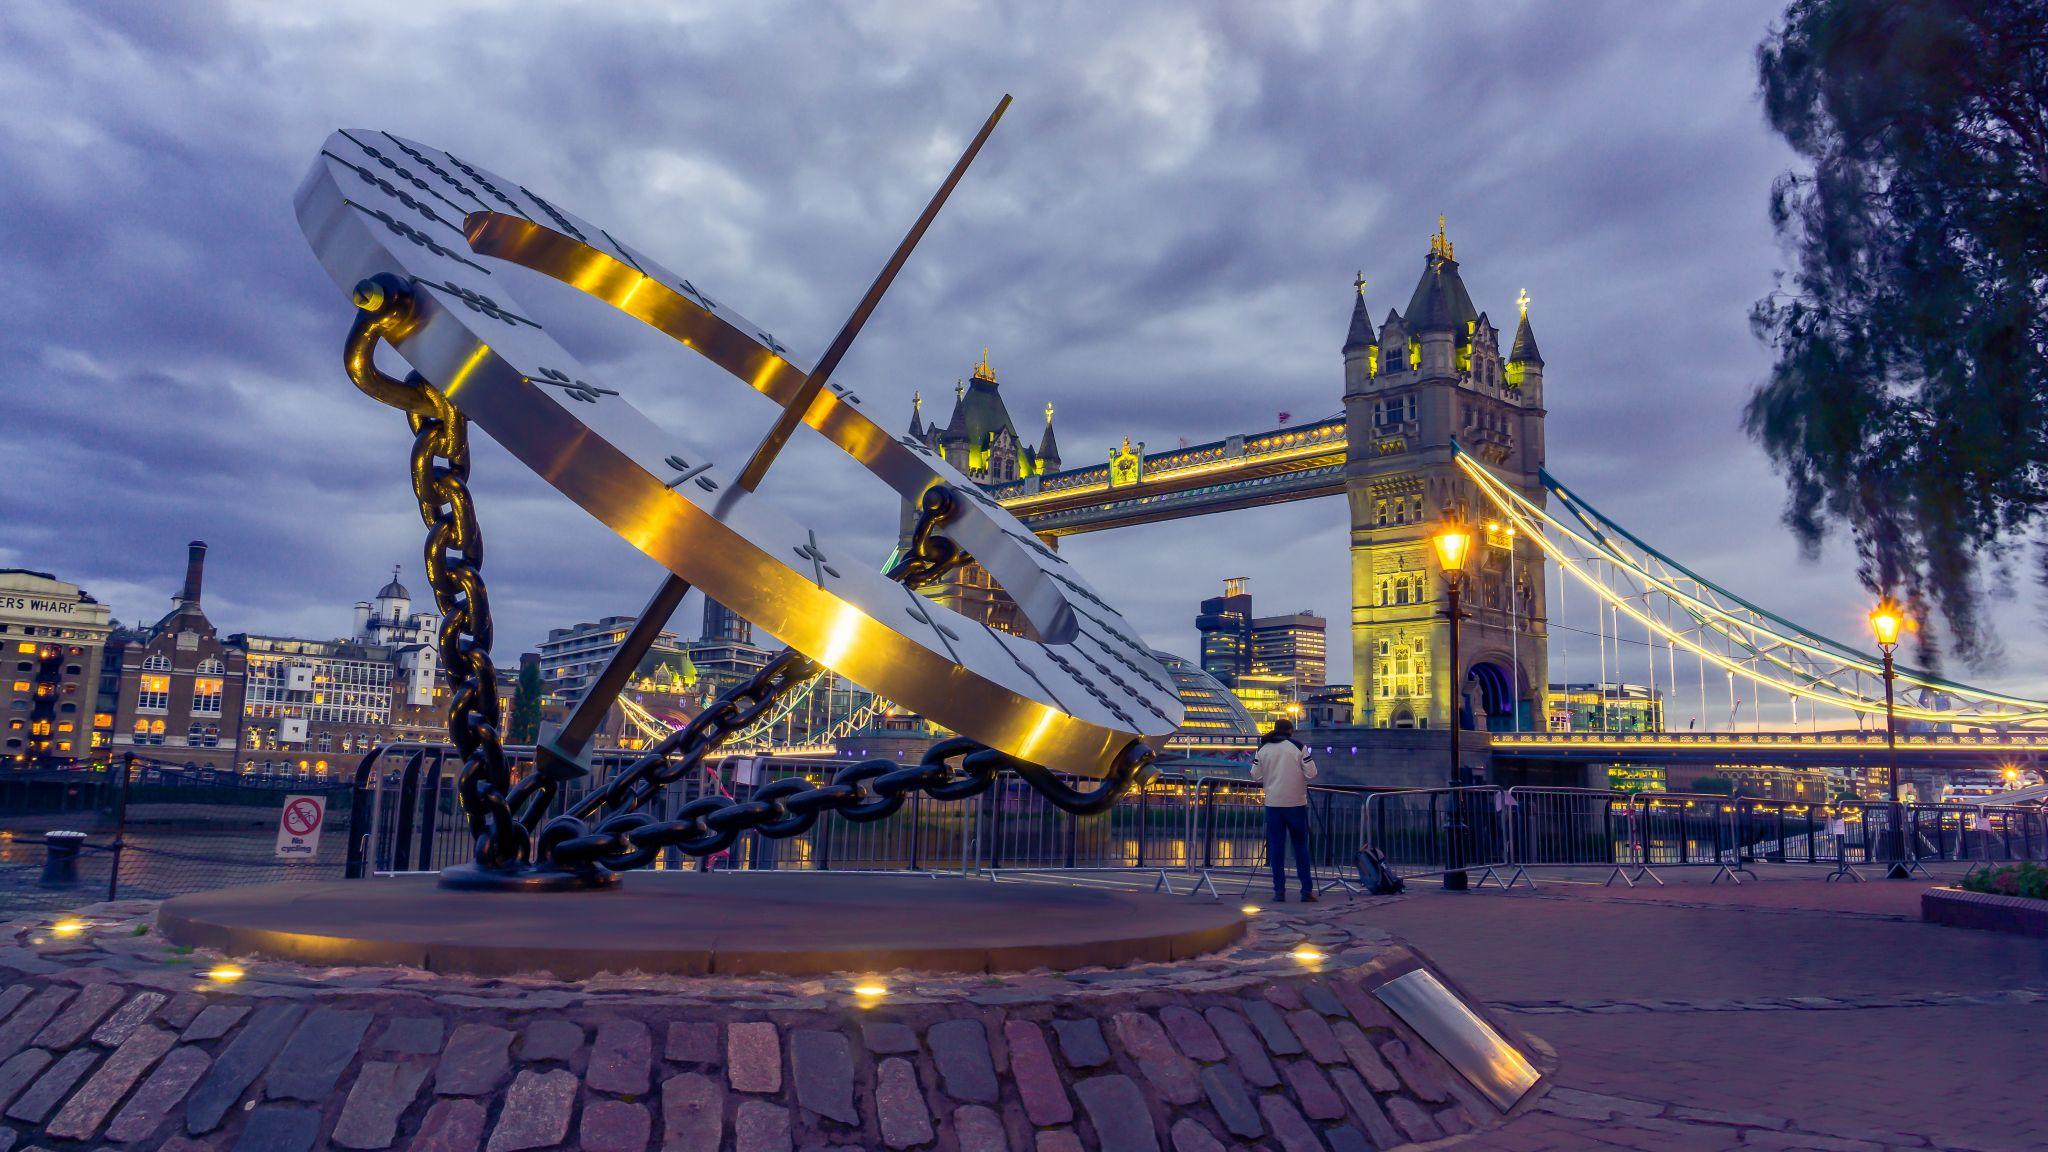 The Timepiece Sundial, United Kingdom